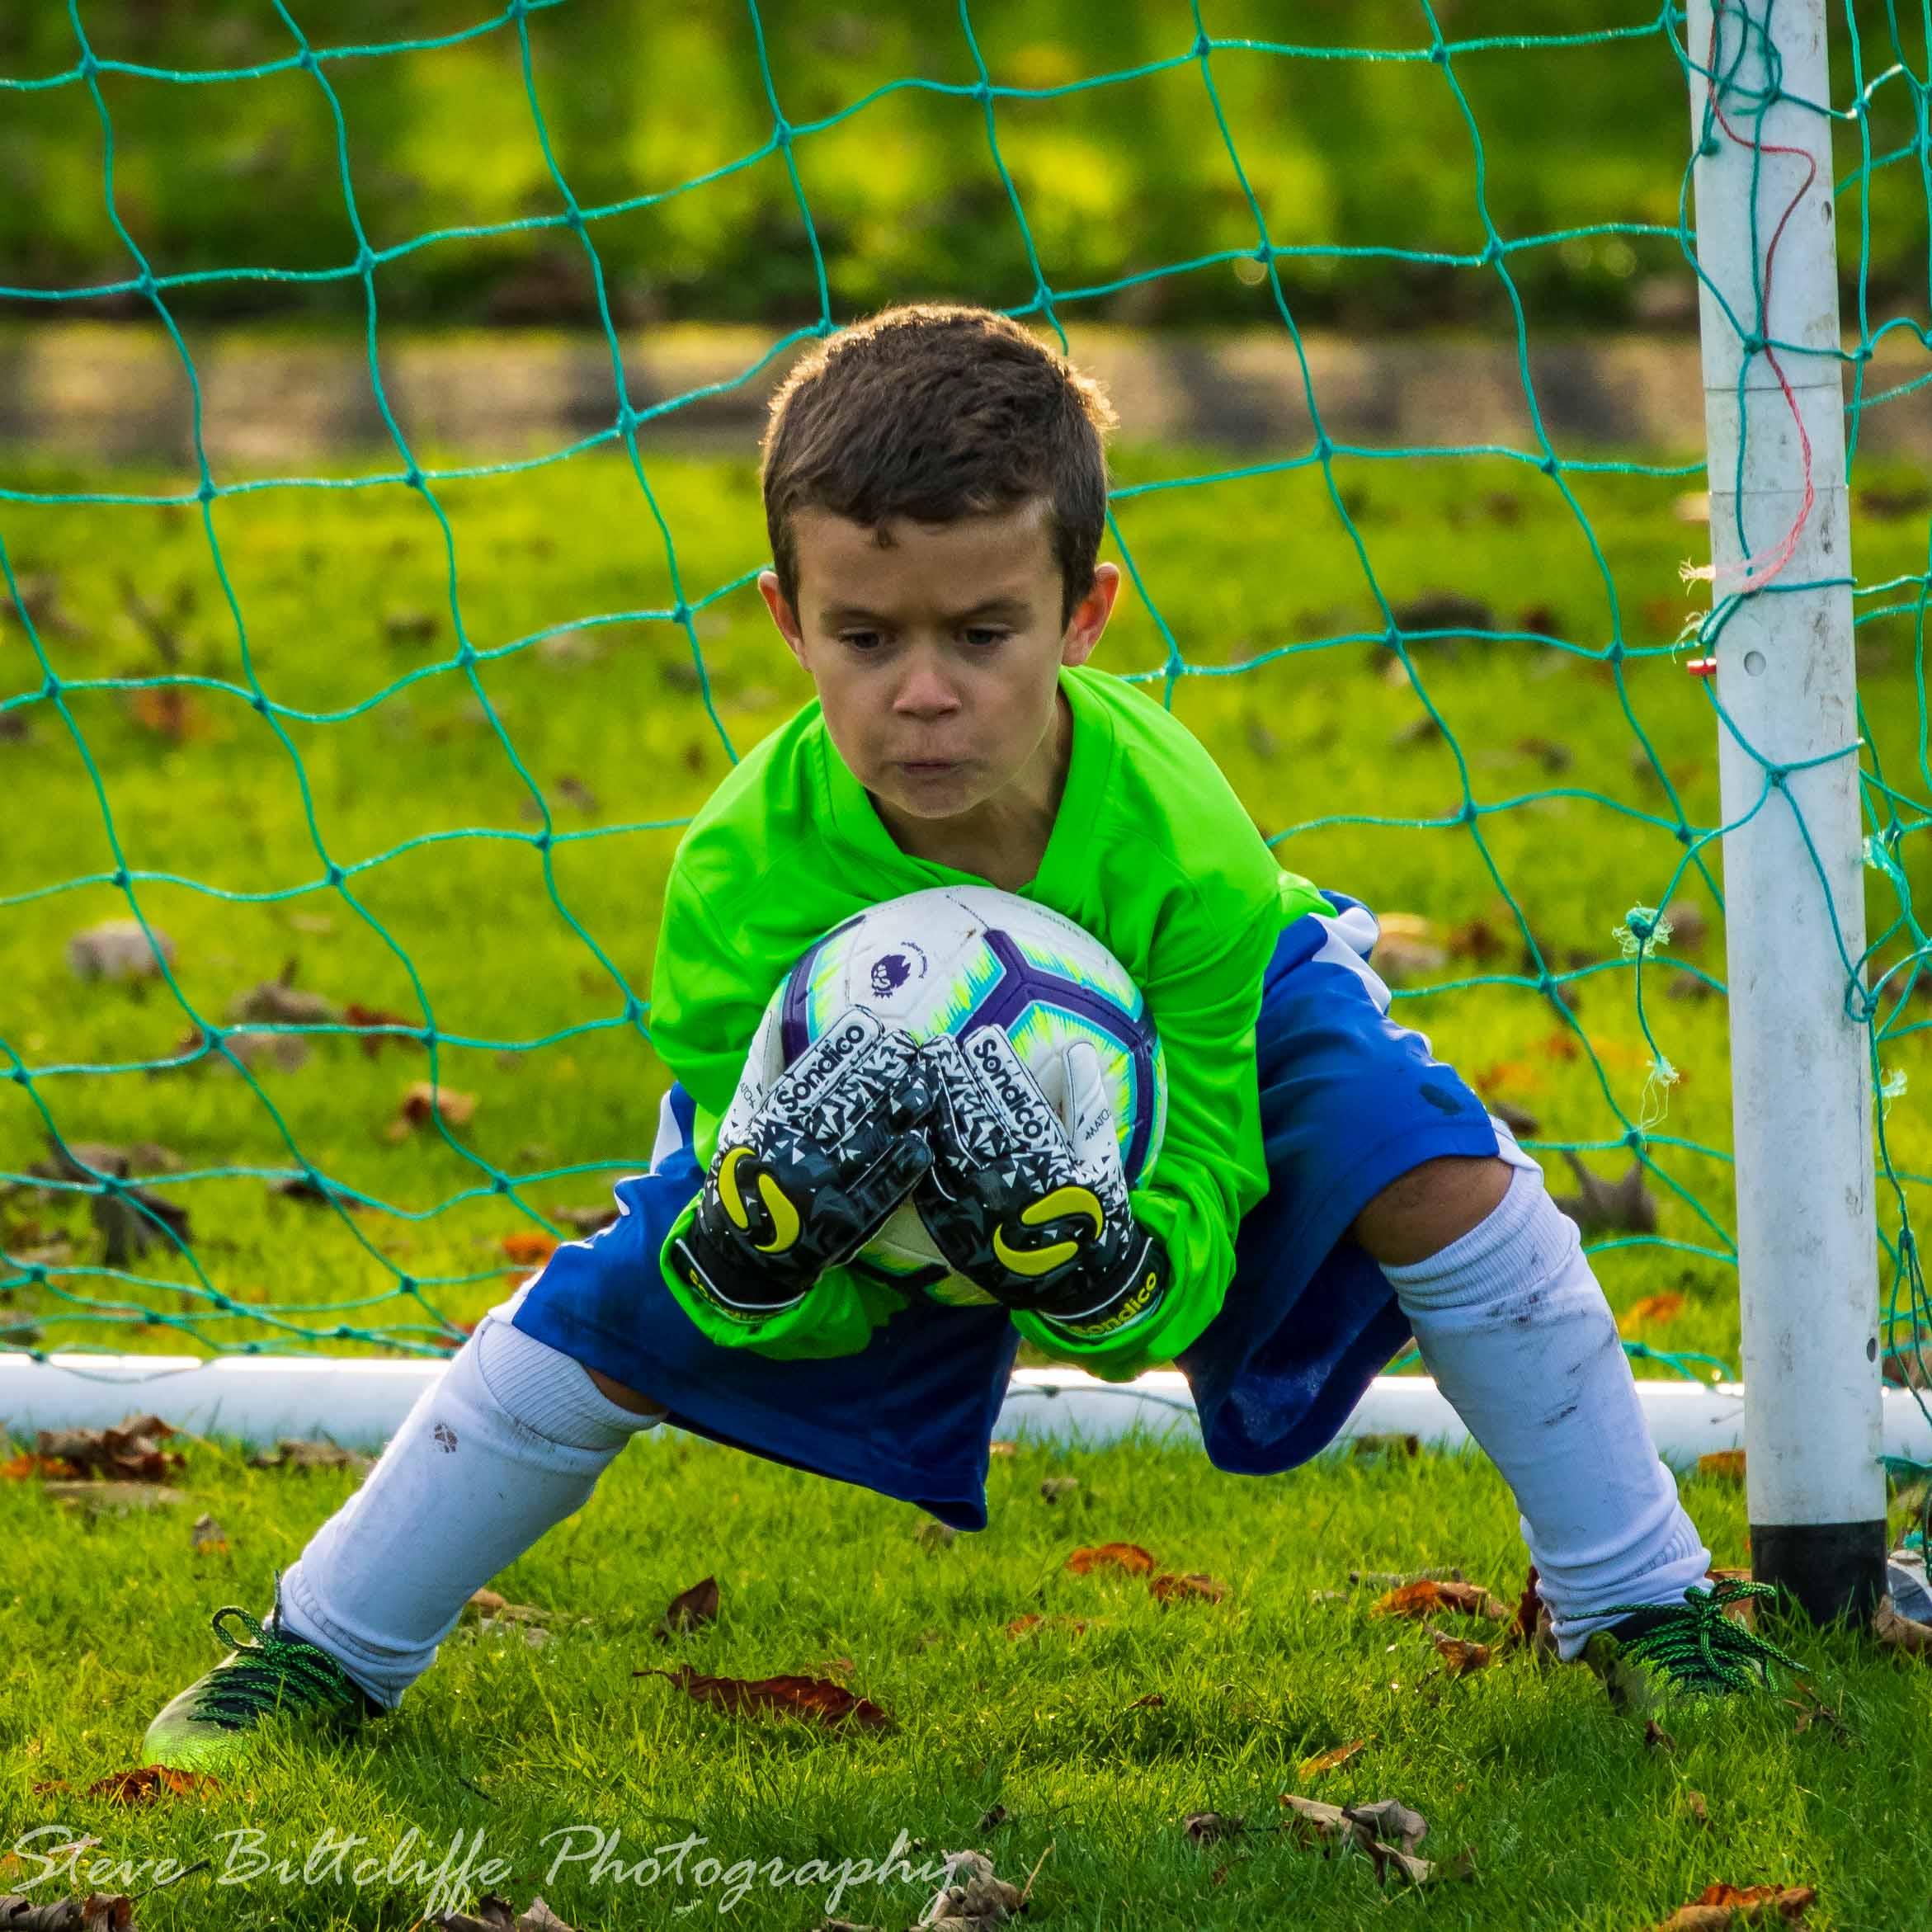 Year 3/4 Football - Tuesday 5th November@ Kings Meadow Academy